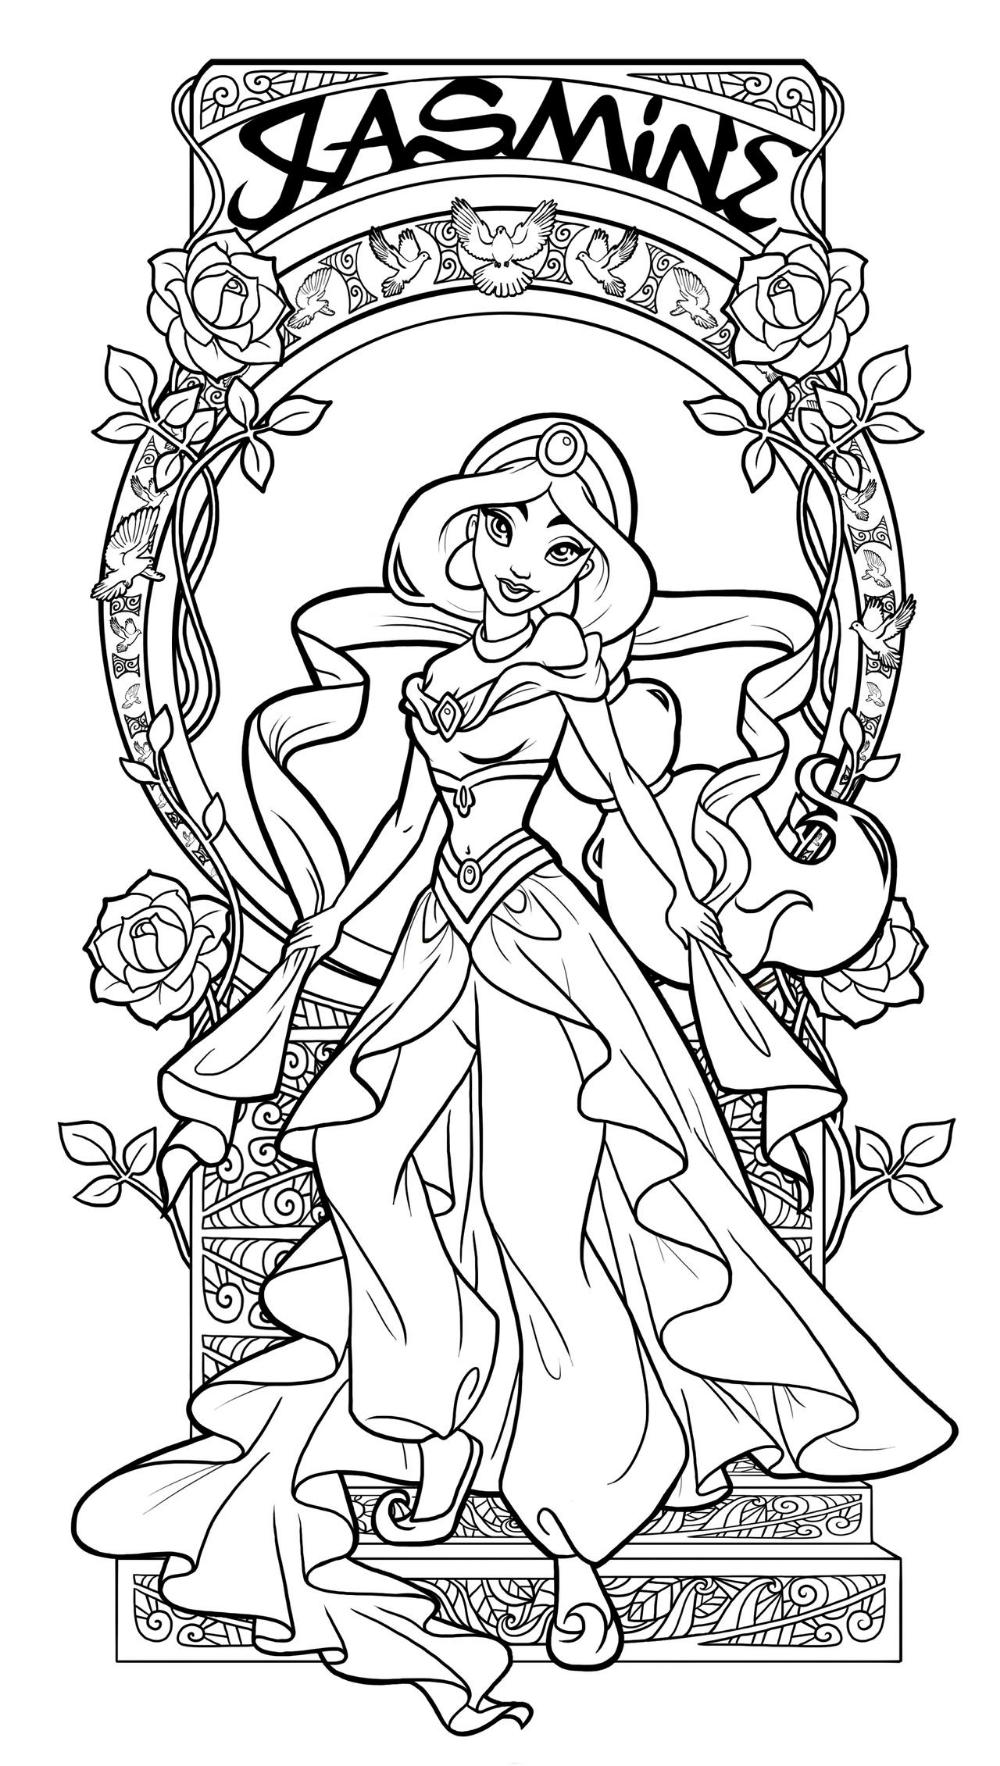 Jasmine Art Nouveau Lineart By Paola Tosca On Deviantart Disney Princess Coloring Pages Princess Coloring Pages Disney Coloring Pages